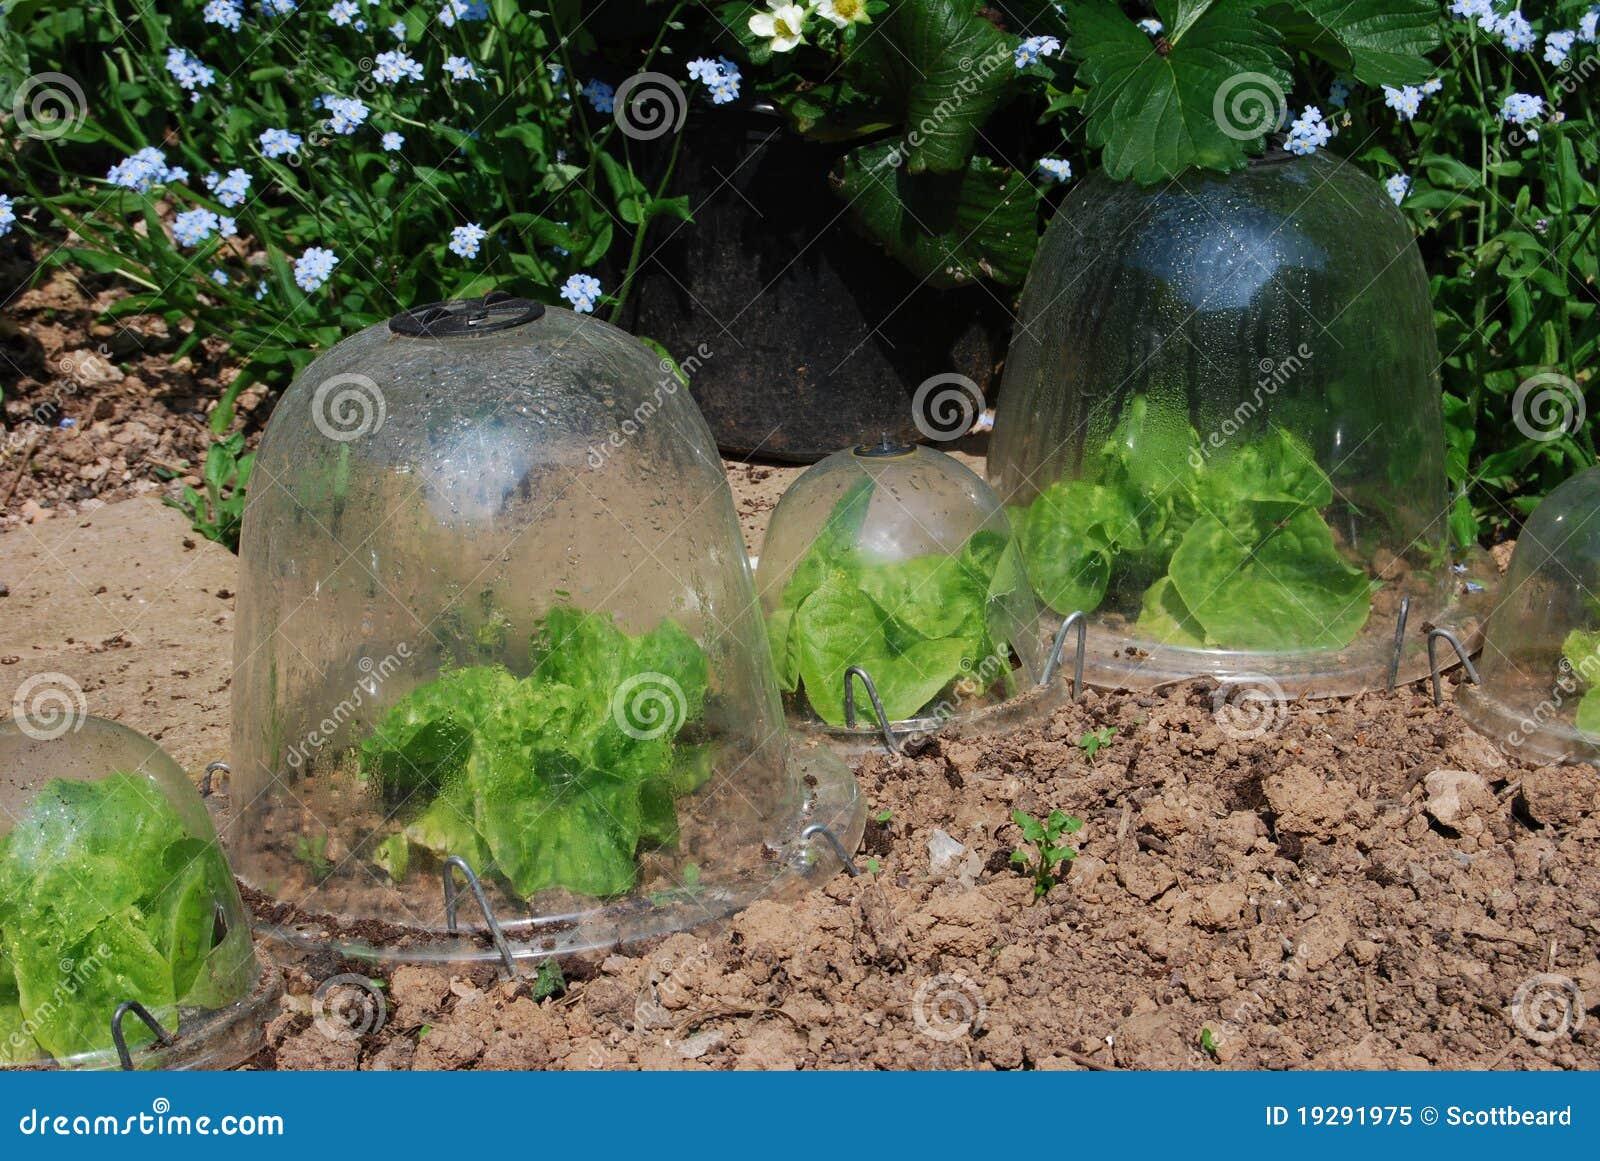 Sla die in tuin plastic stolpen groeien royalty vrije for Plastic kuipstoel tuin